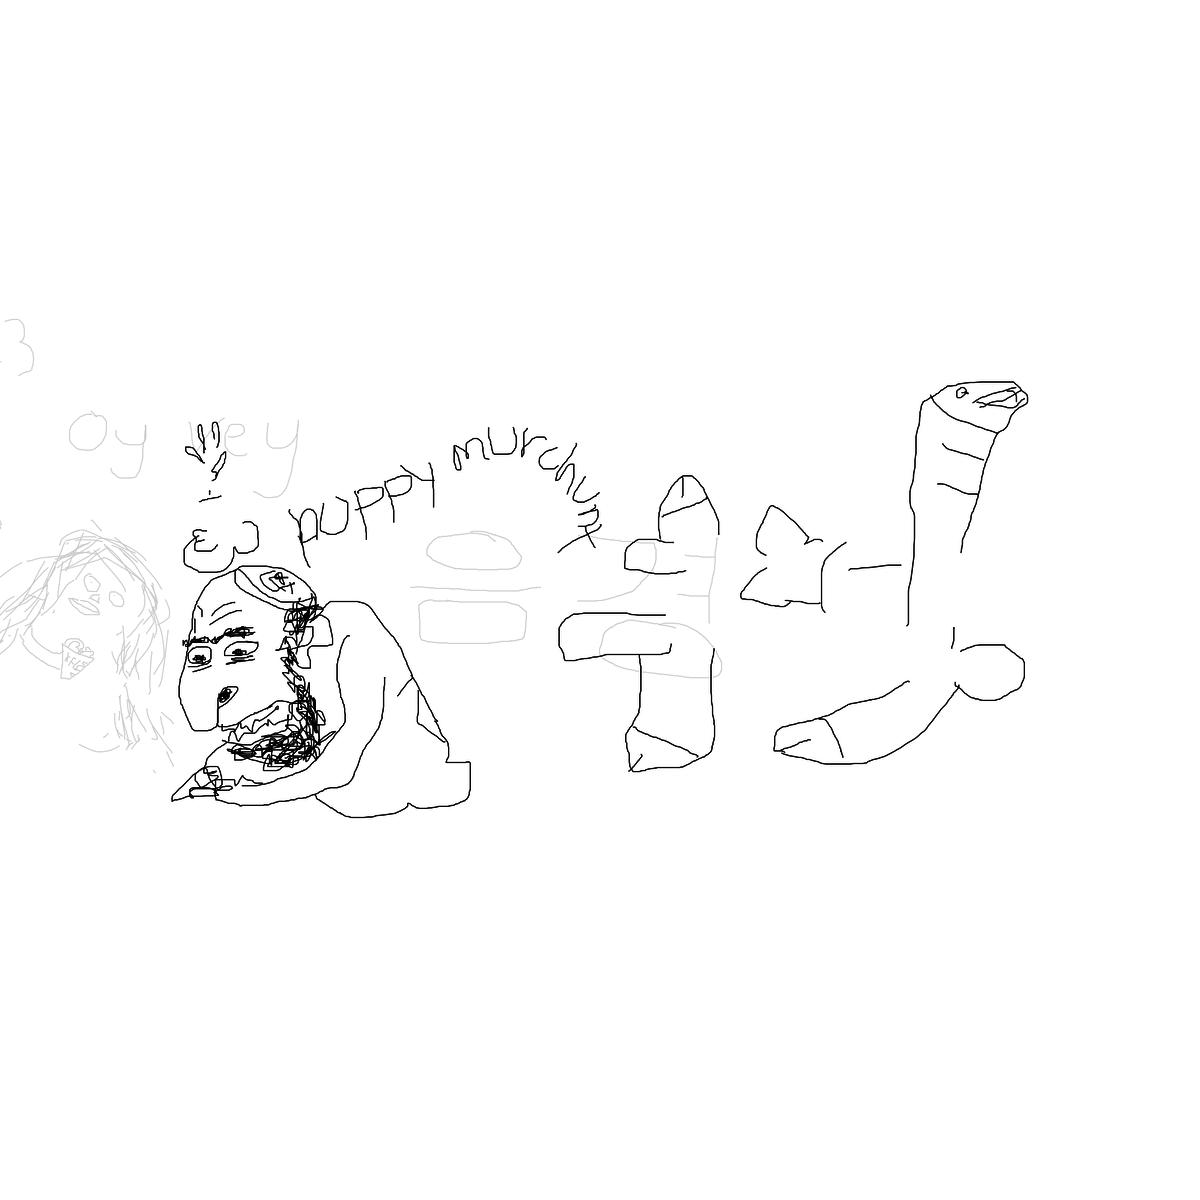 BAAAM drawing#7605 lat:39.0251884460449200lng: 125.7609176635742200